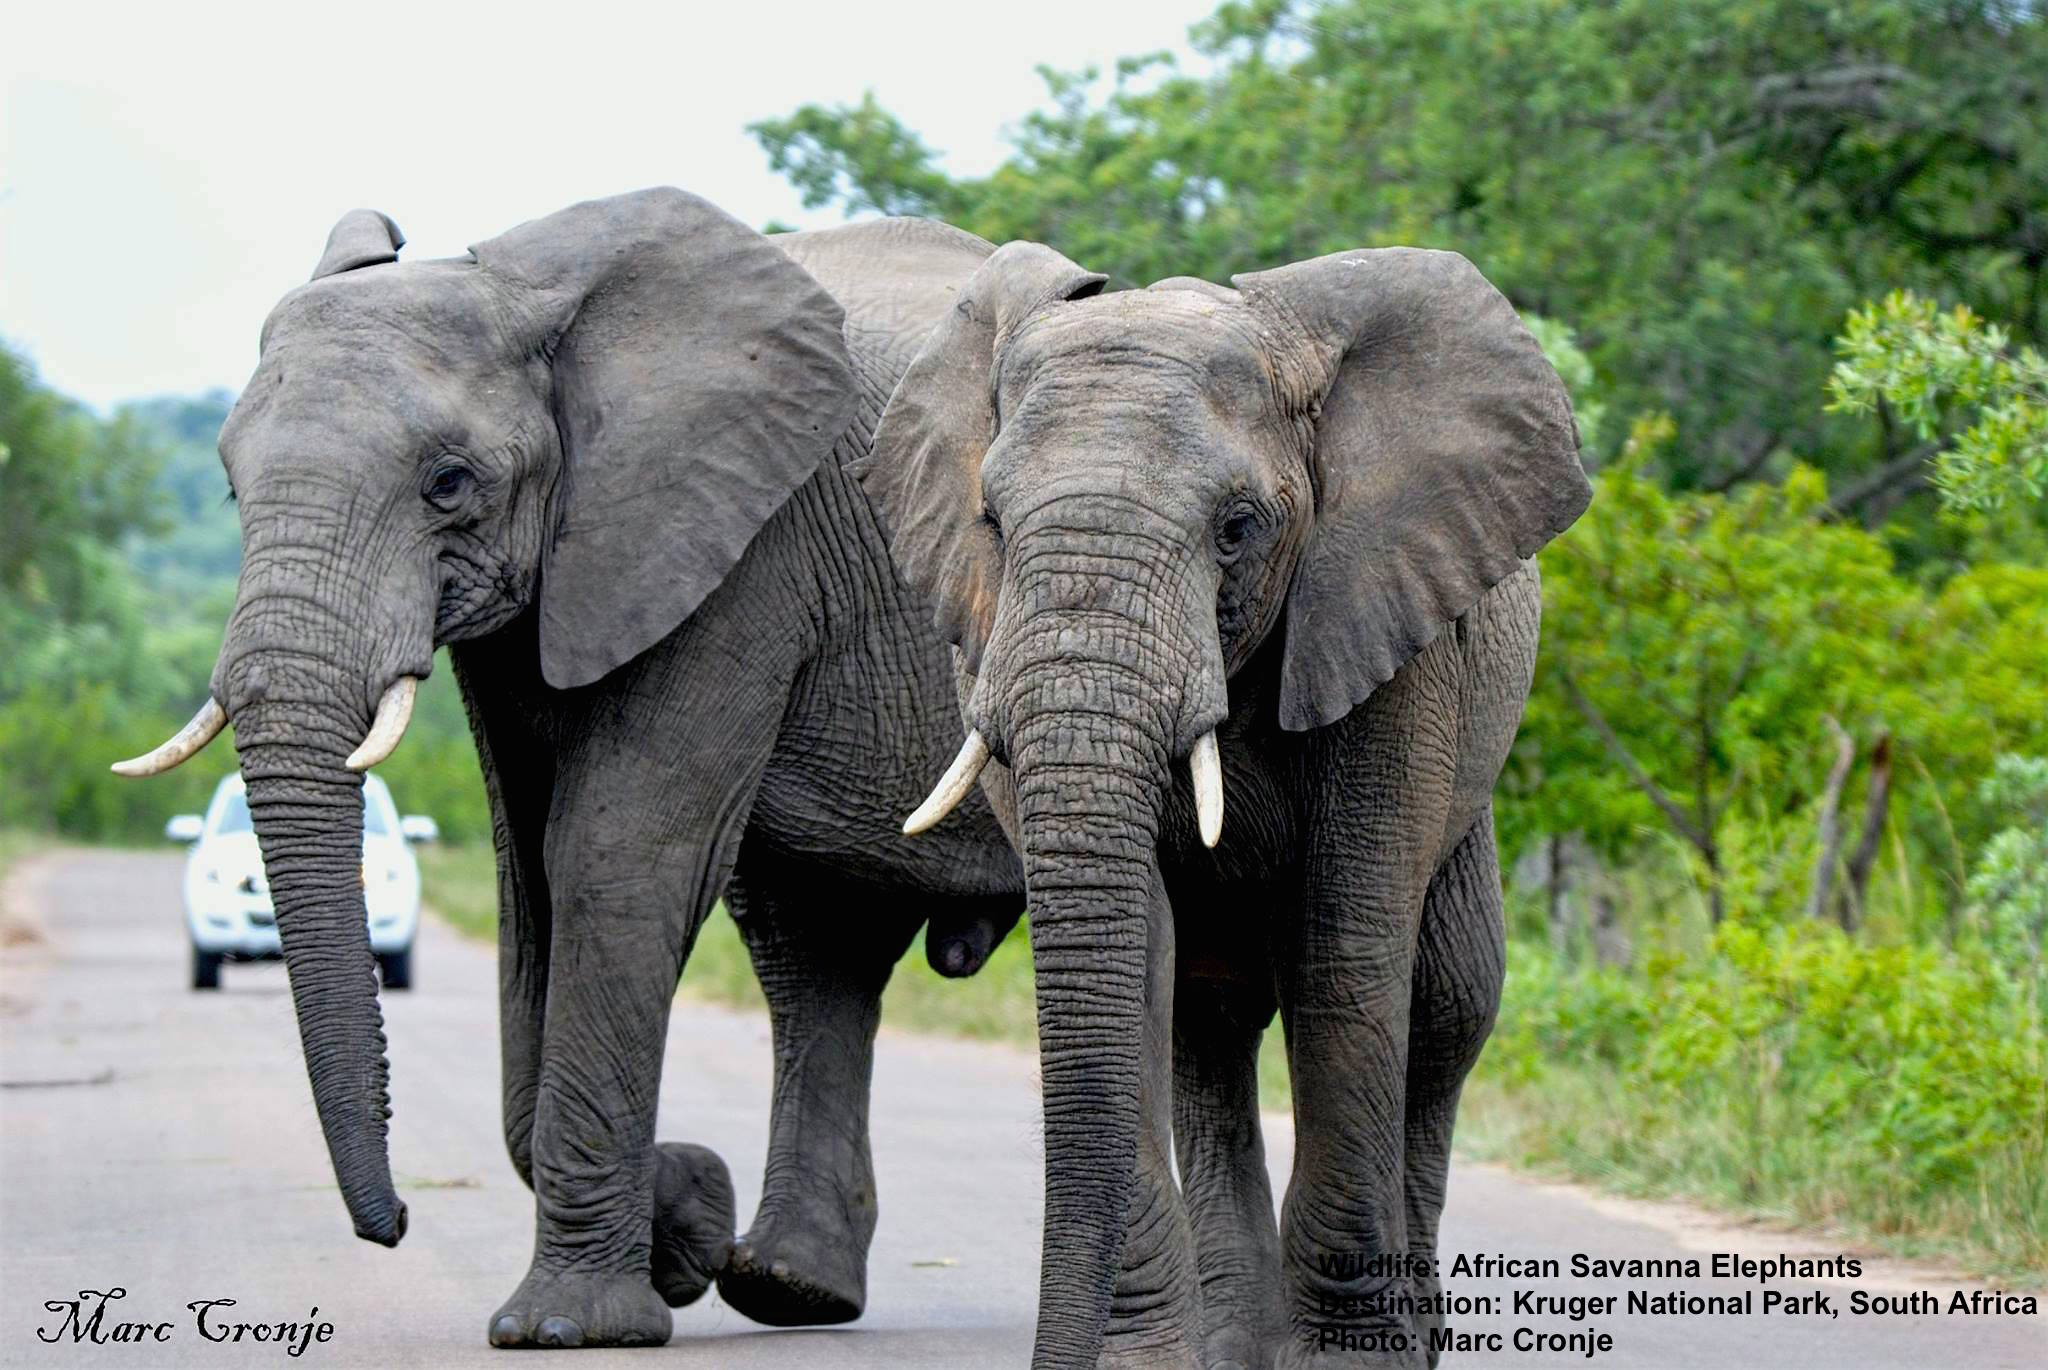 ELEPHANTS ARE THE MANATEE'S CLOSEST RELATIVE. IMAGE: MARC CRONJE